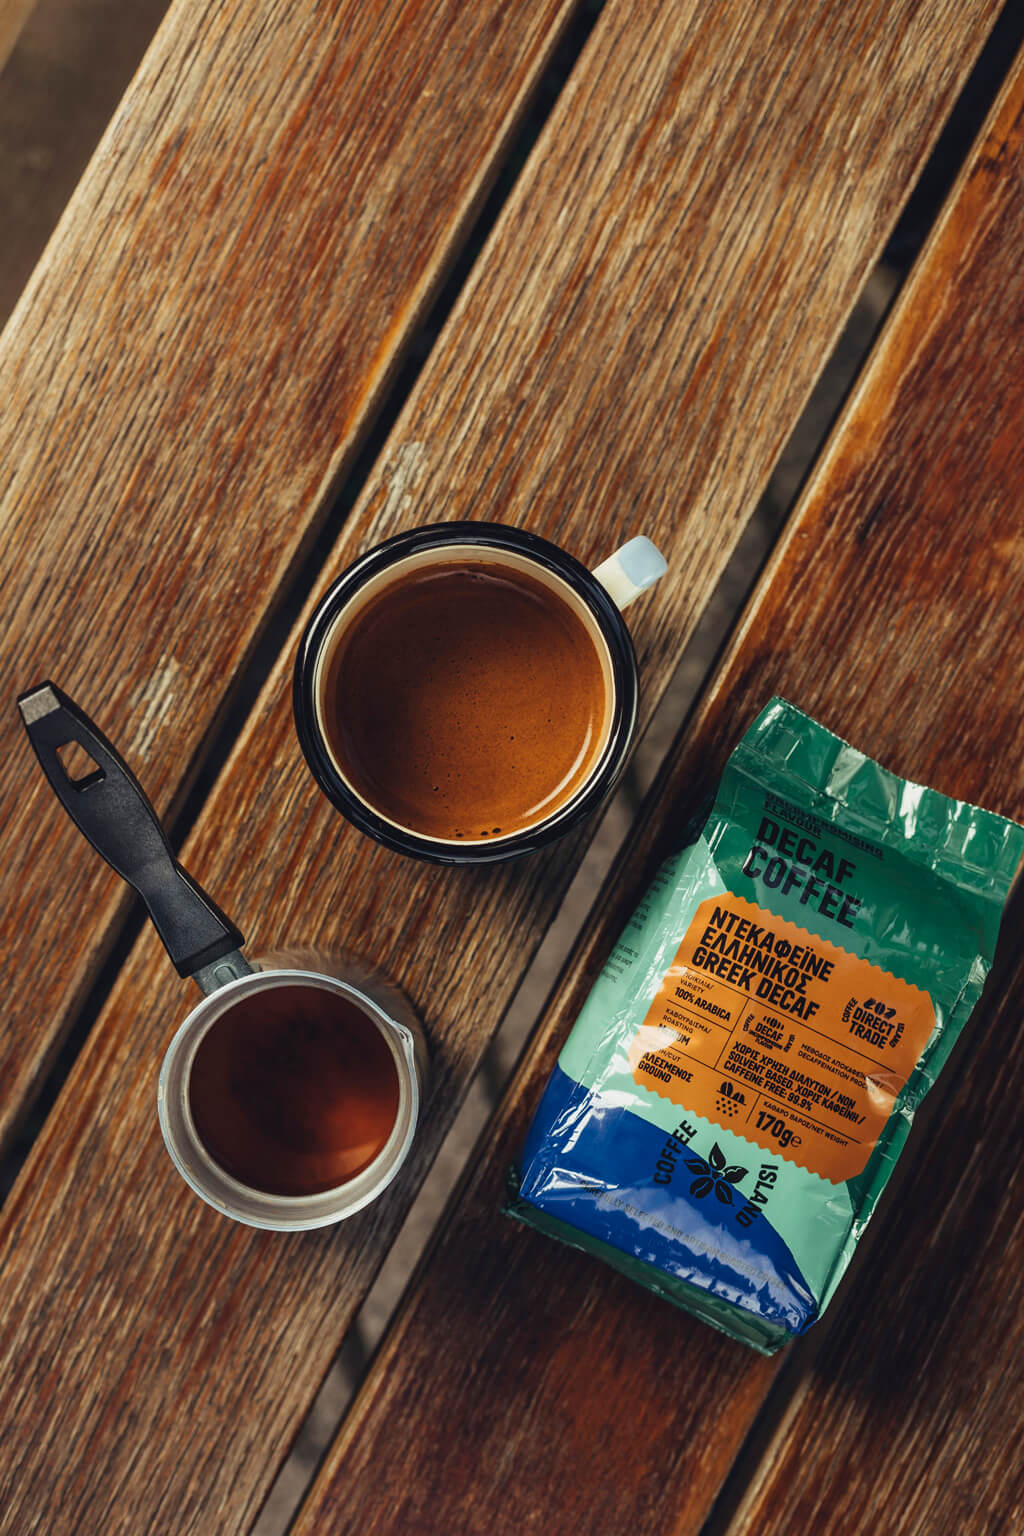 Coffee Island's ibrik decaf coffee.